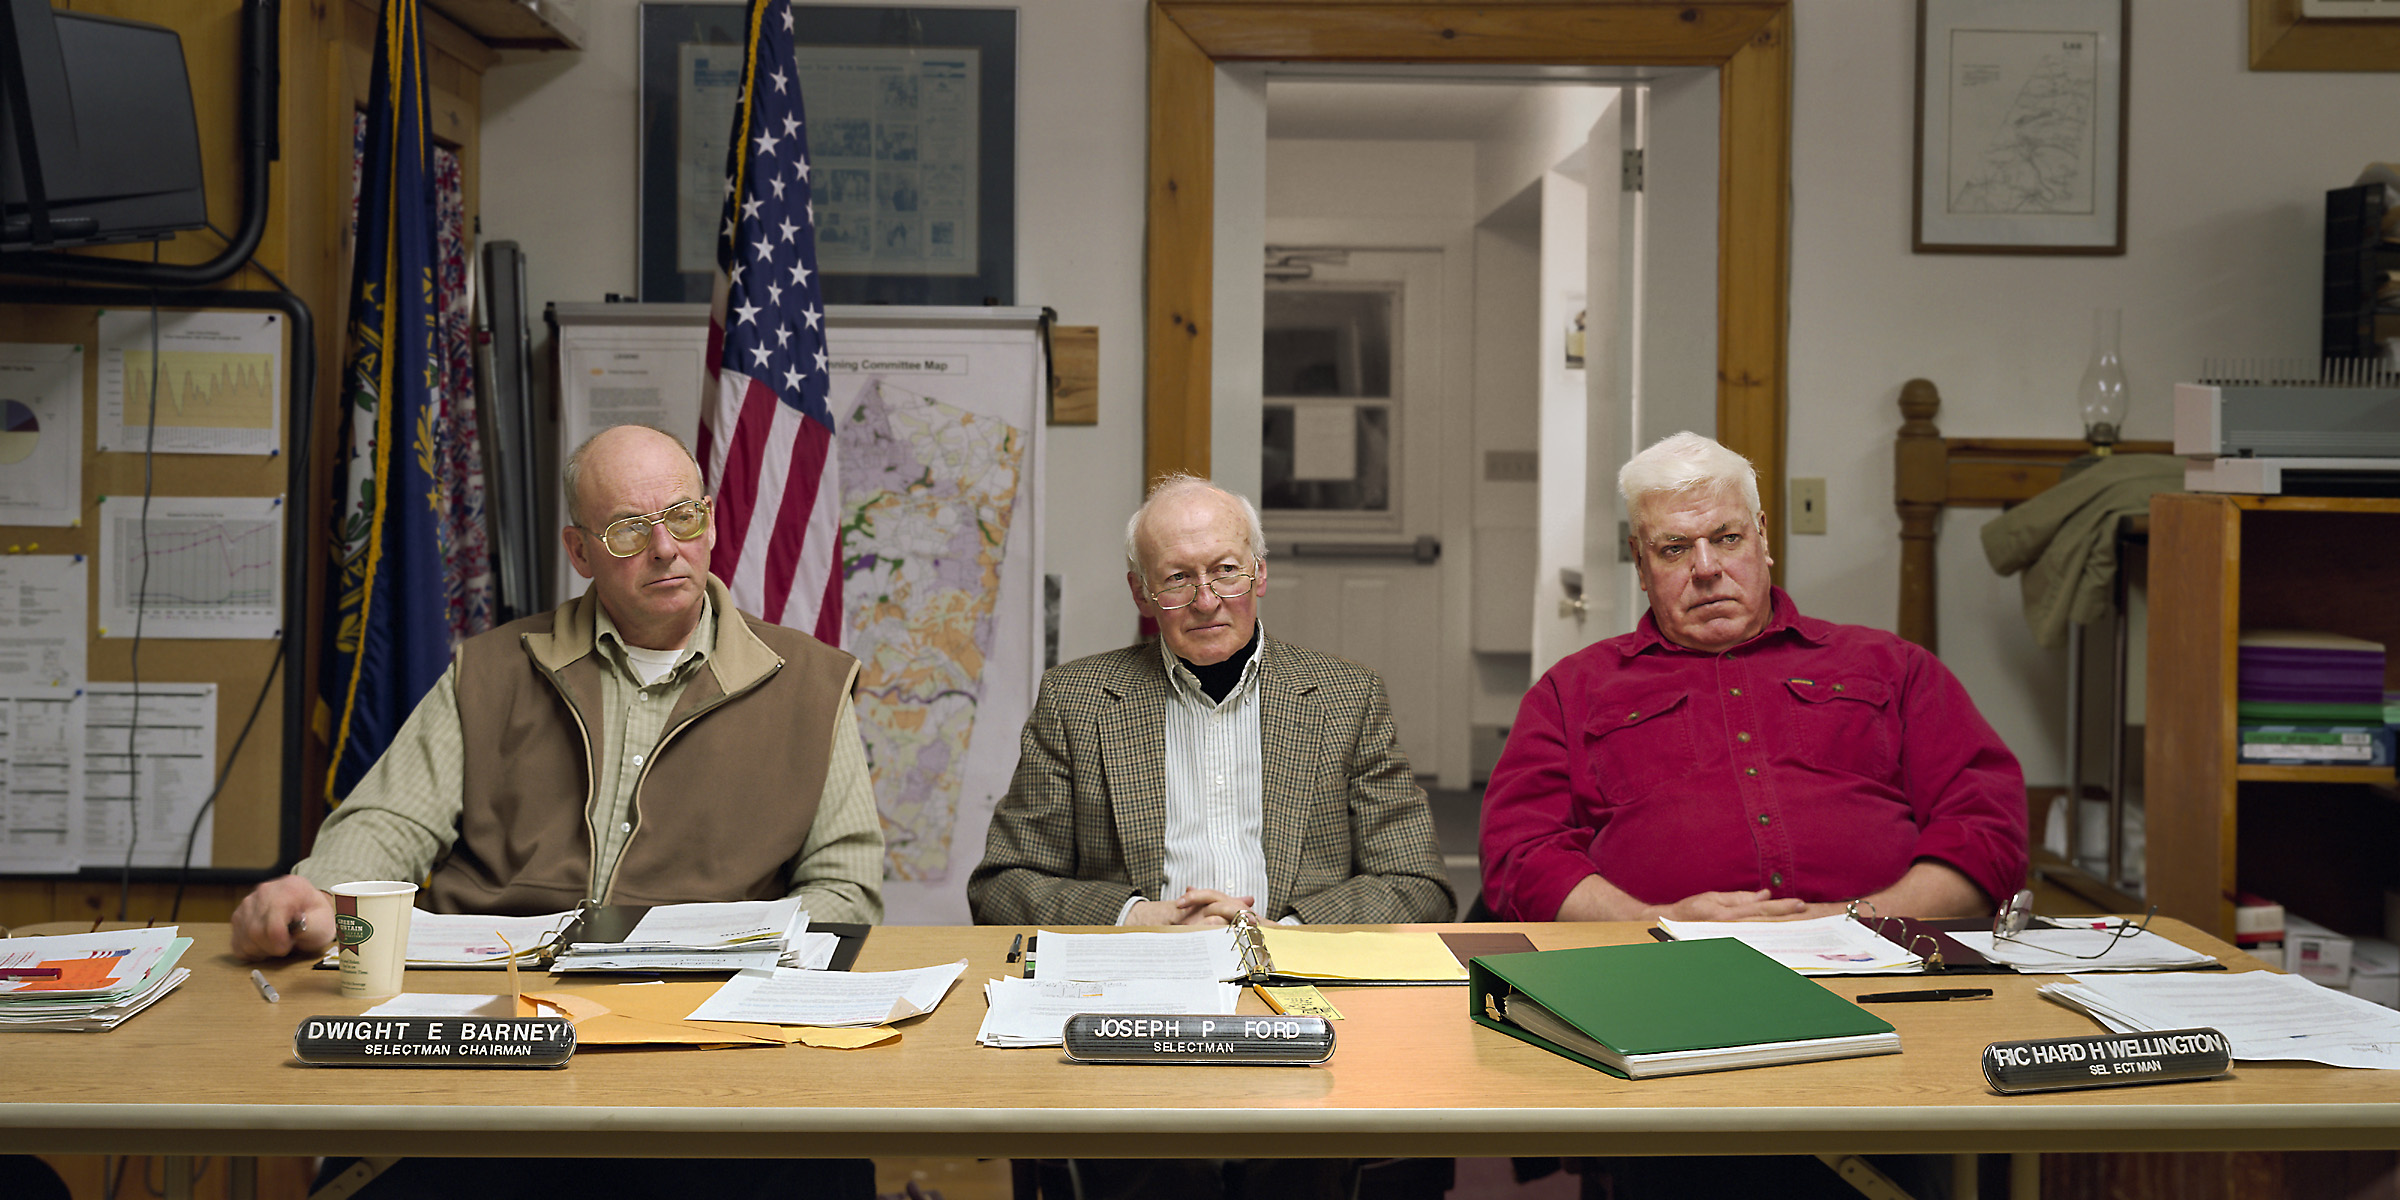 Lee, New Hampshire (population 4,145) Board of Selectmen, January 27, 2003 (L to R) Dwight Barney (Chairman), Joseph Ford, Richard Wellington, 2003.